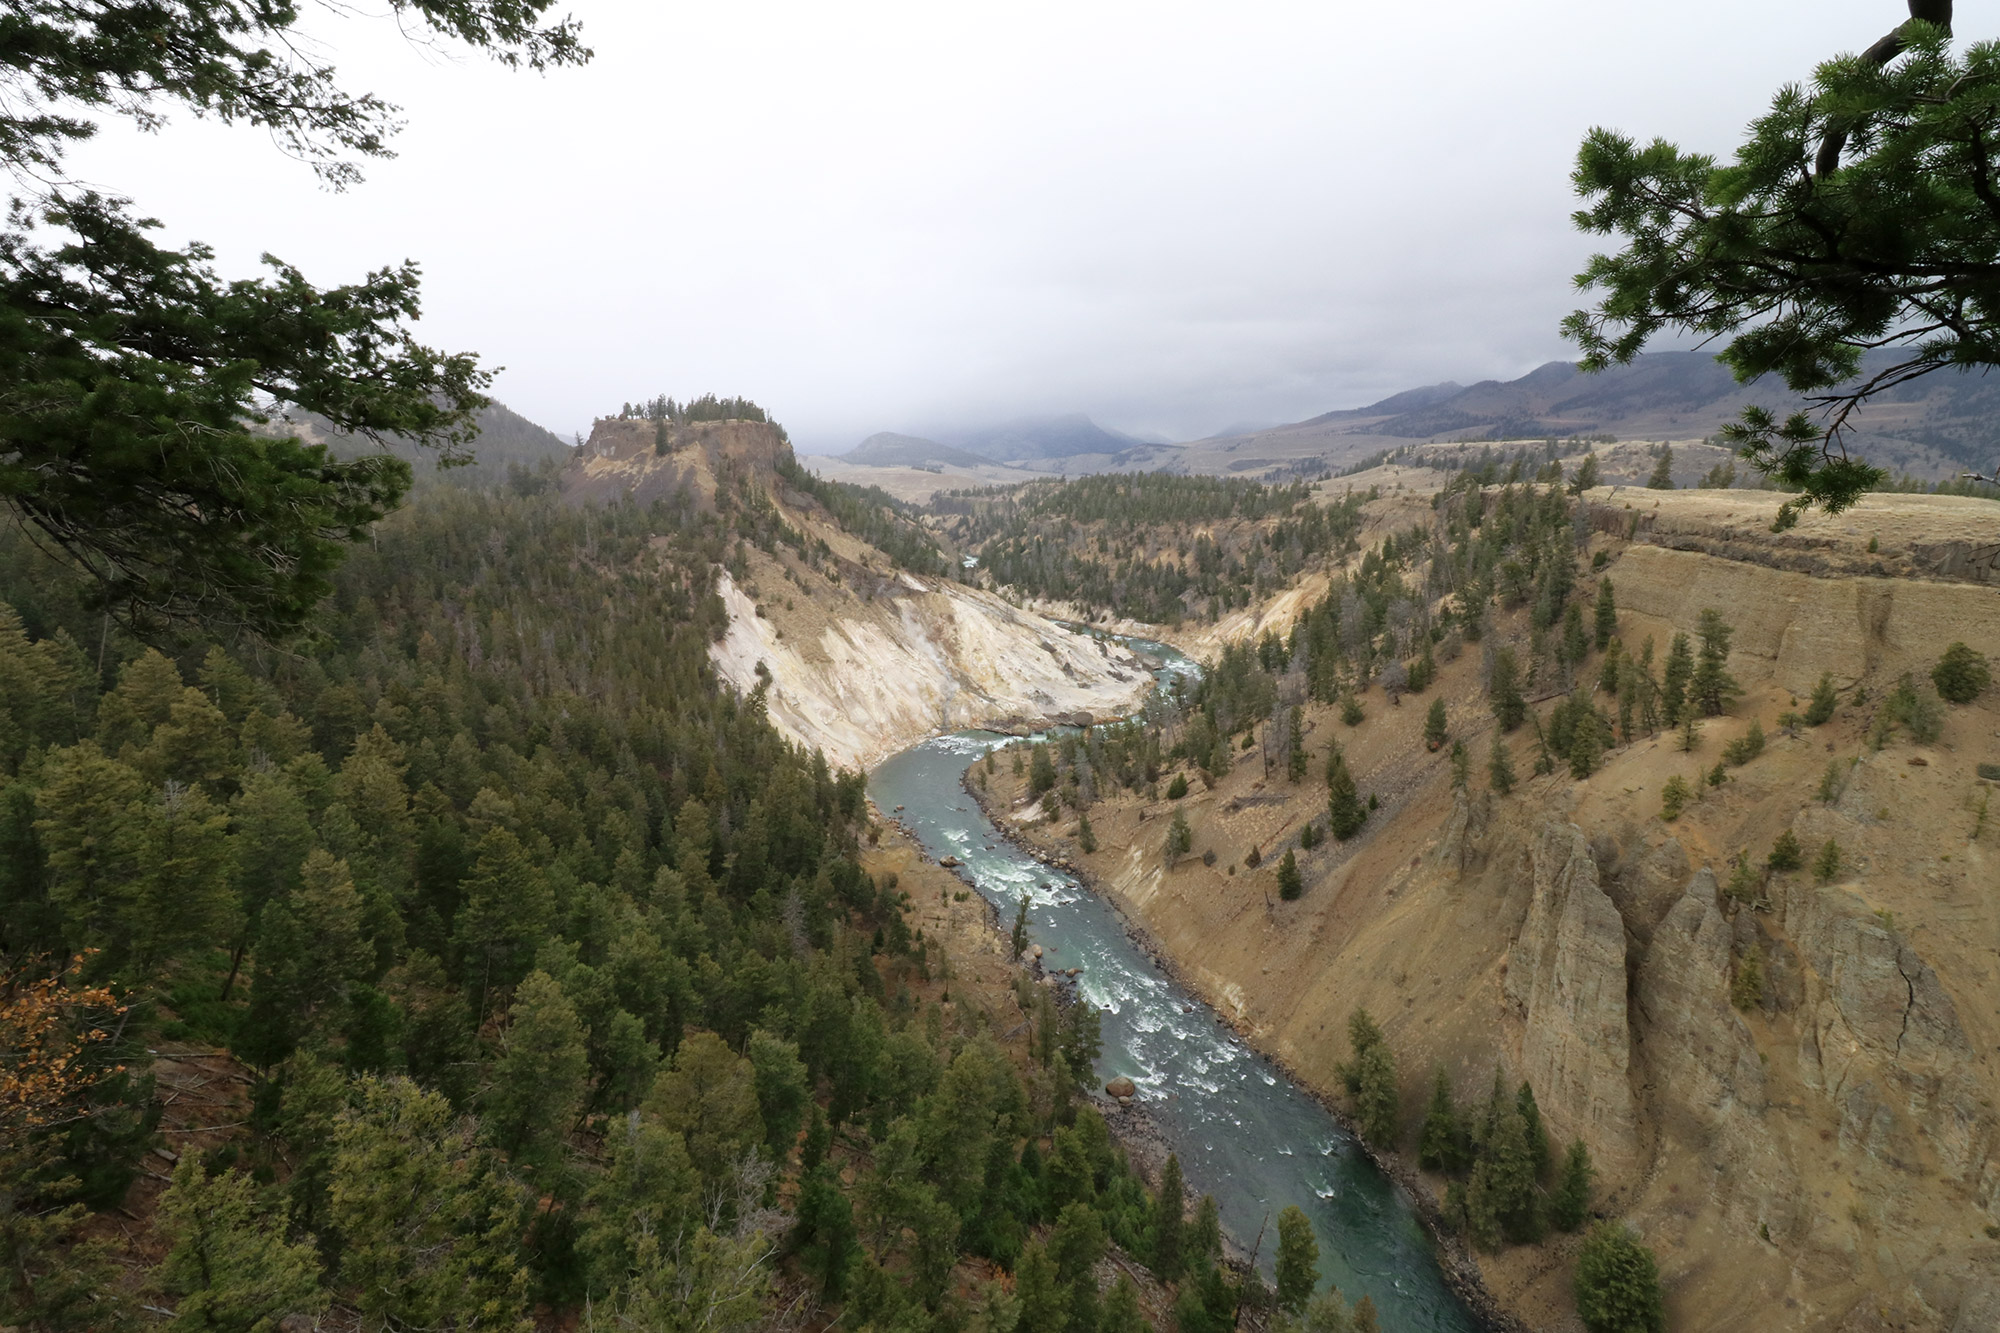 Amerika dag 4 - Yellowstone National Park - Undine Falls Trail